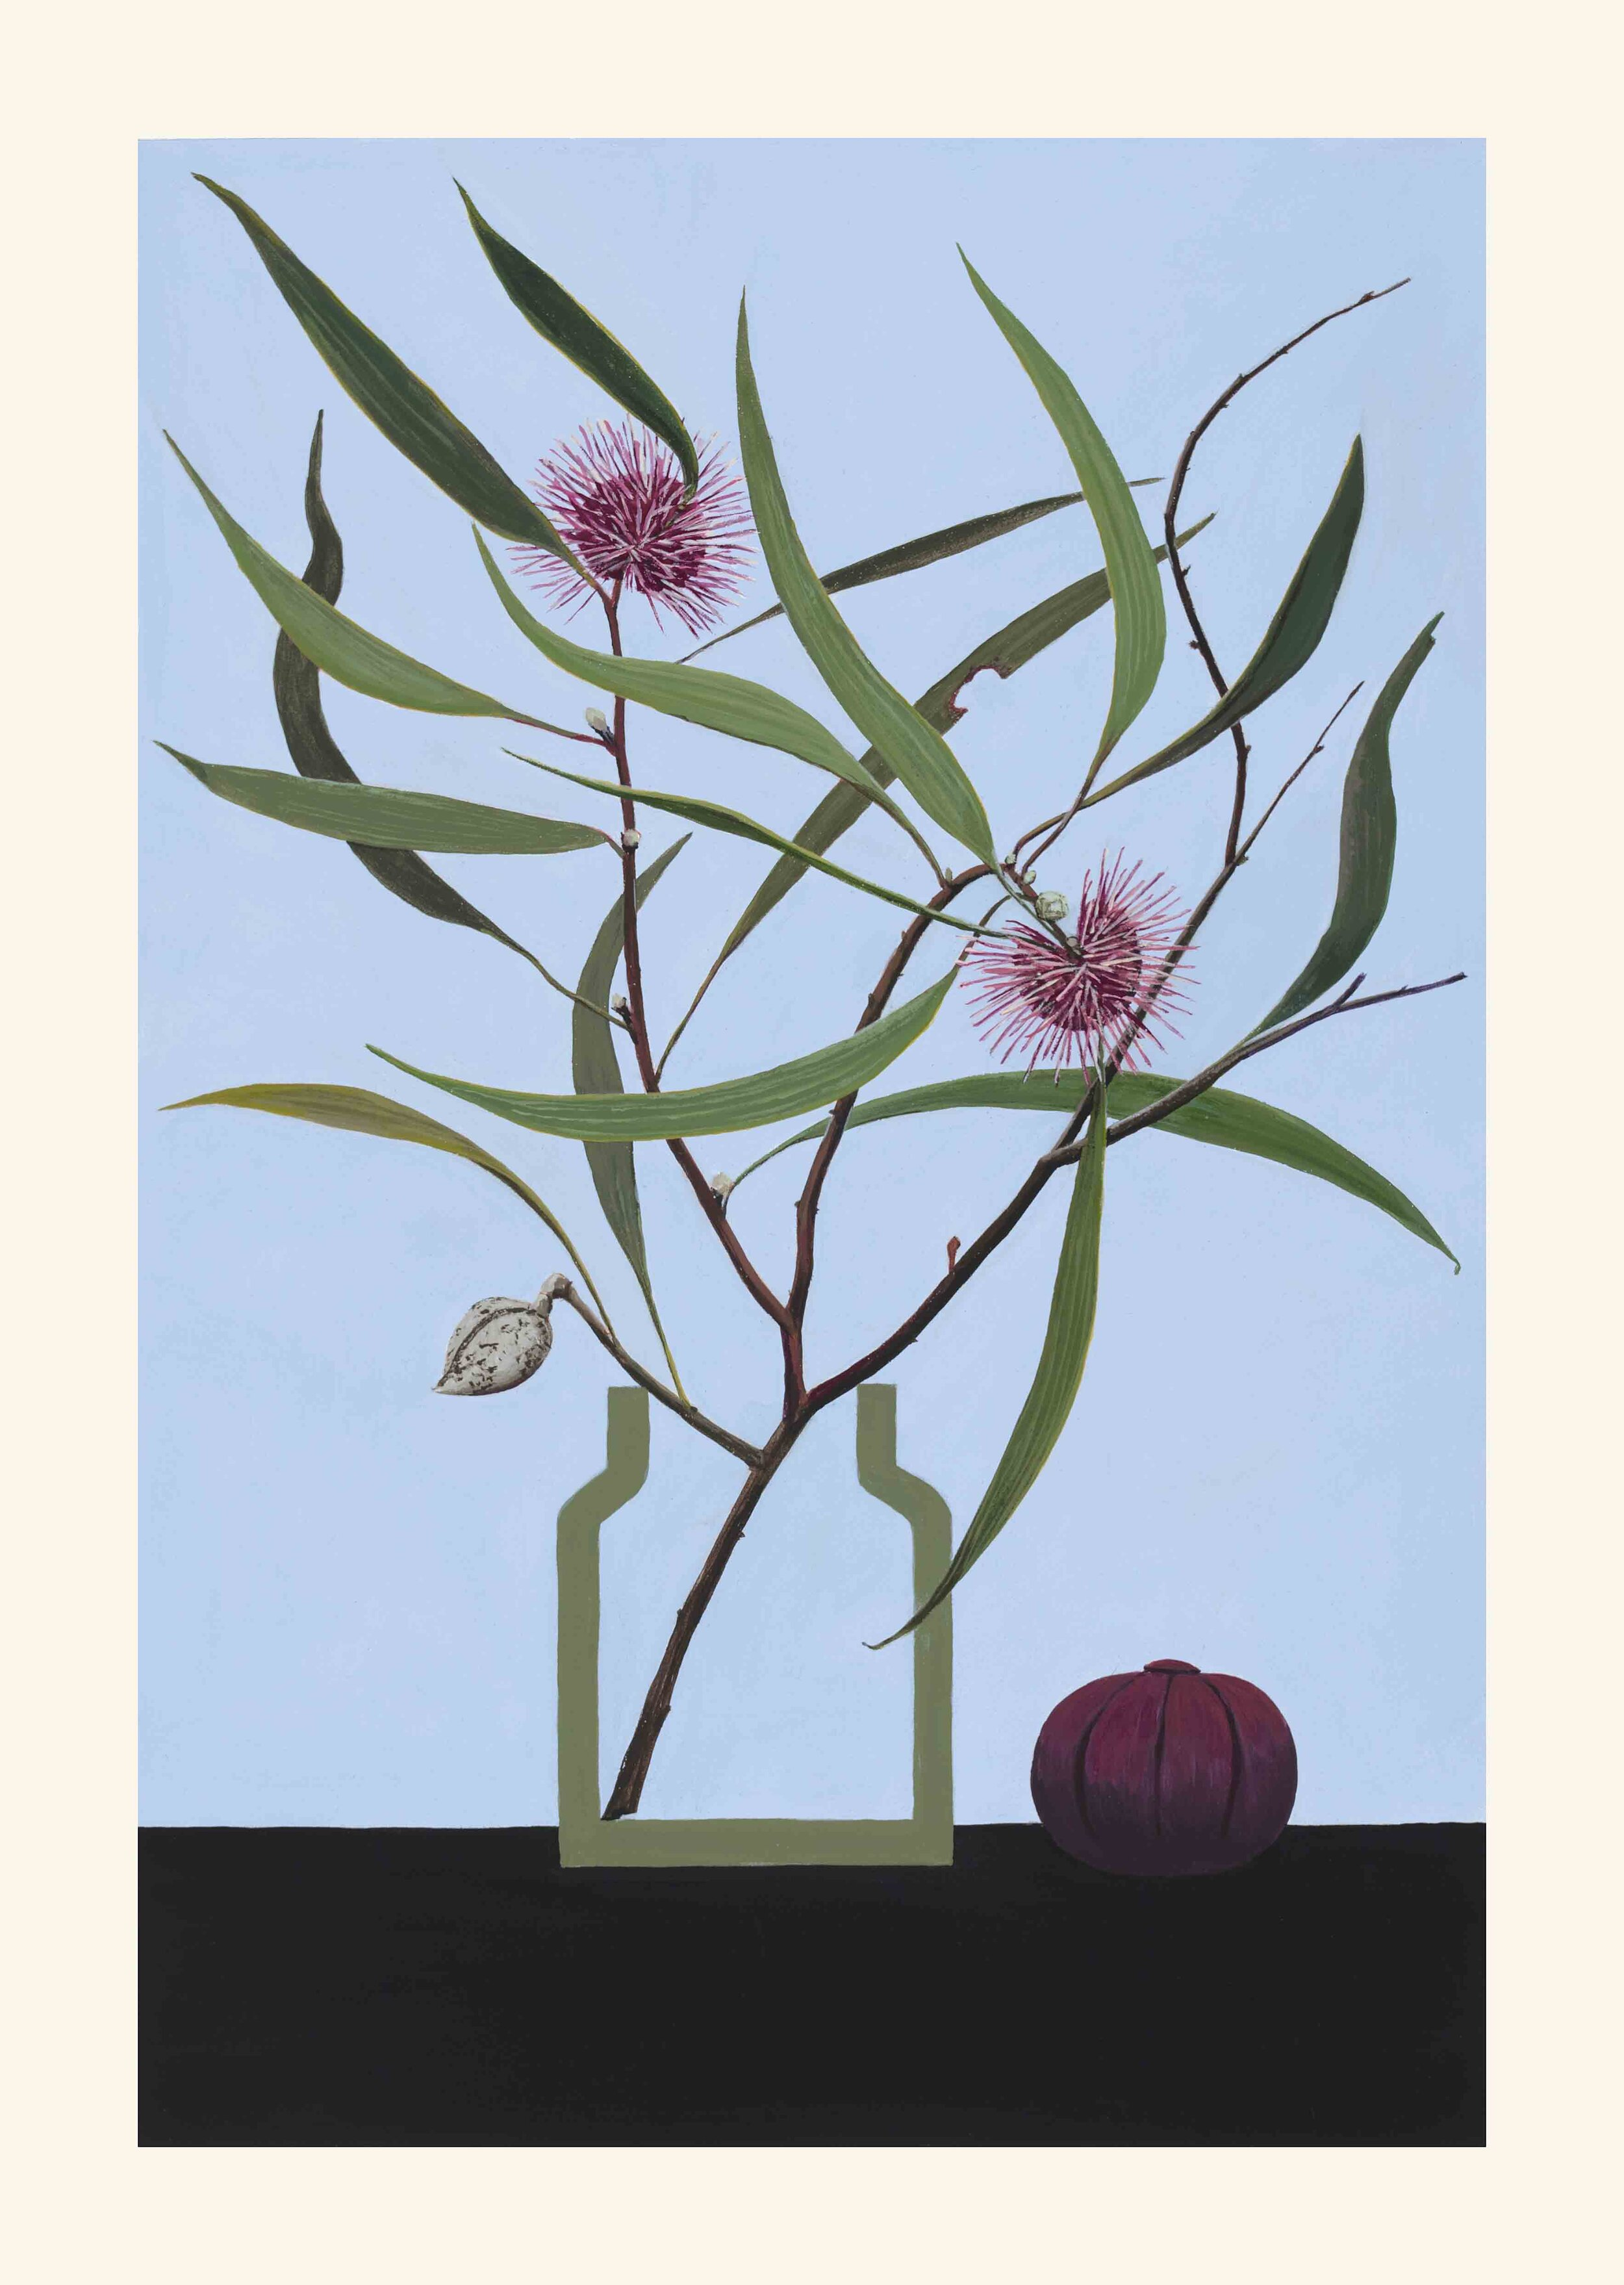 44. Joss Gregson, Still Life-Hakea laurina, 2019, acrylic over gesso on paper, 42 x 30 cm $825